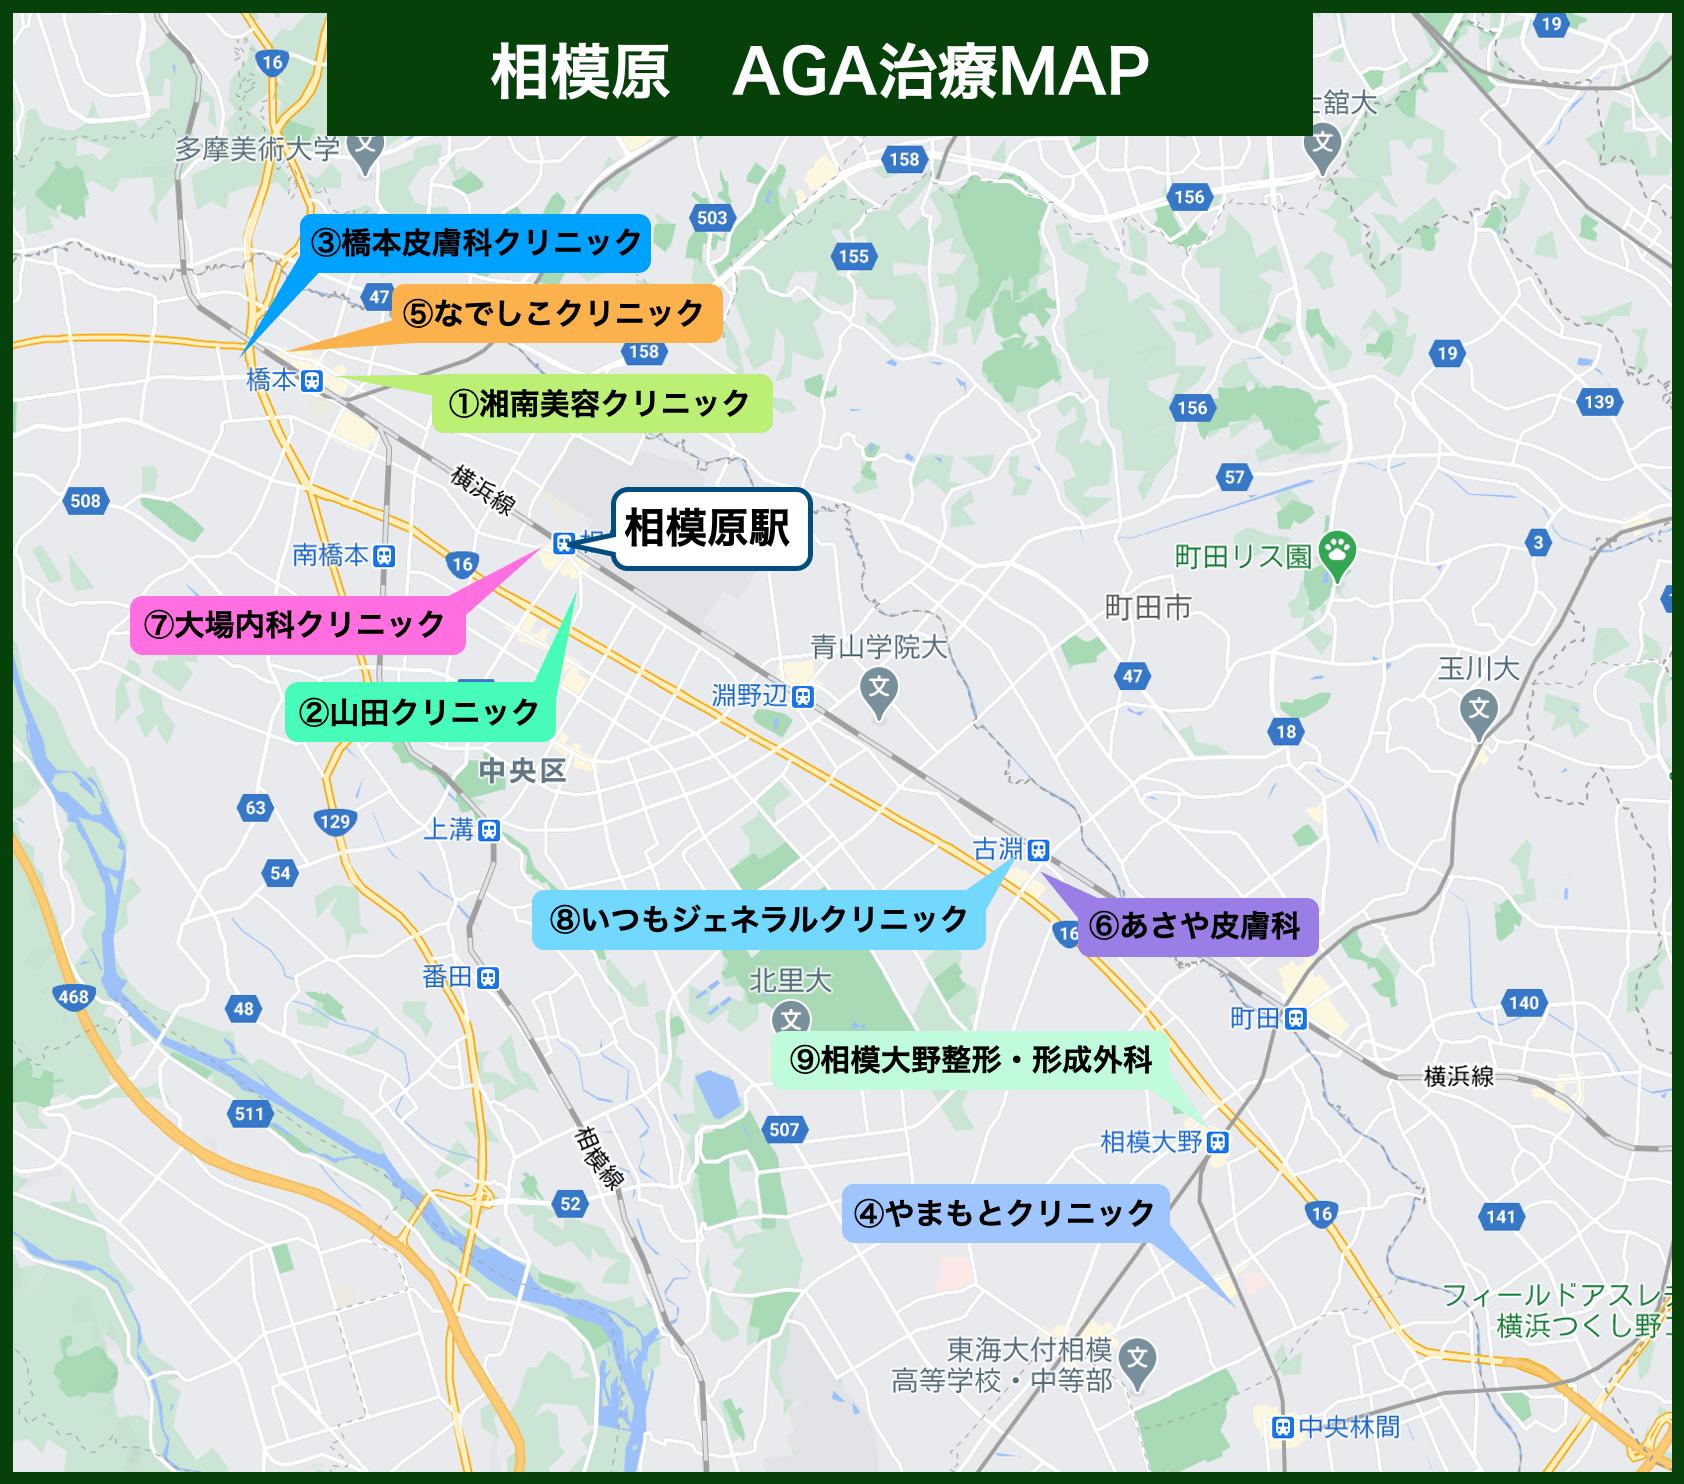 相模原 AGA治療MAP